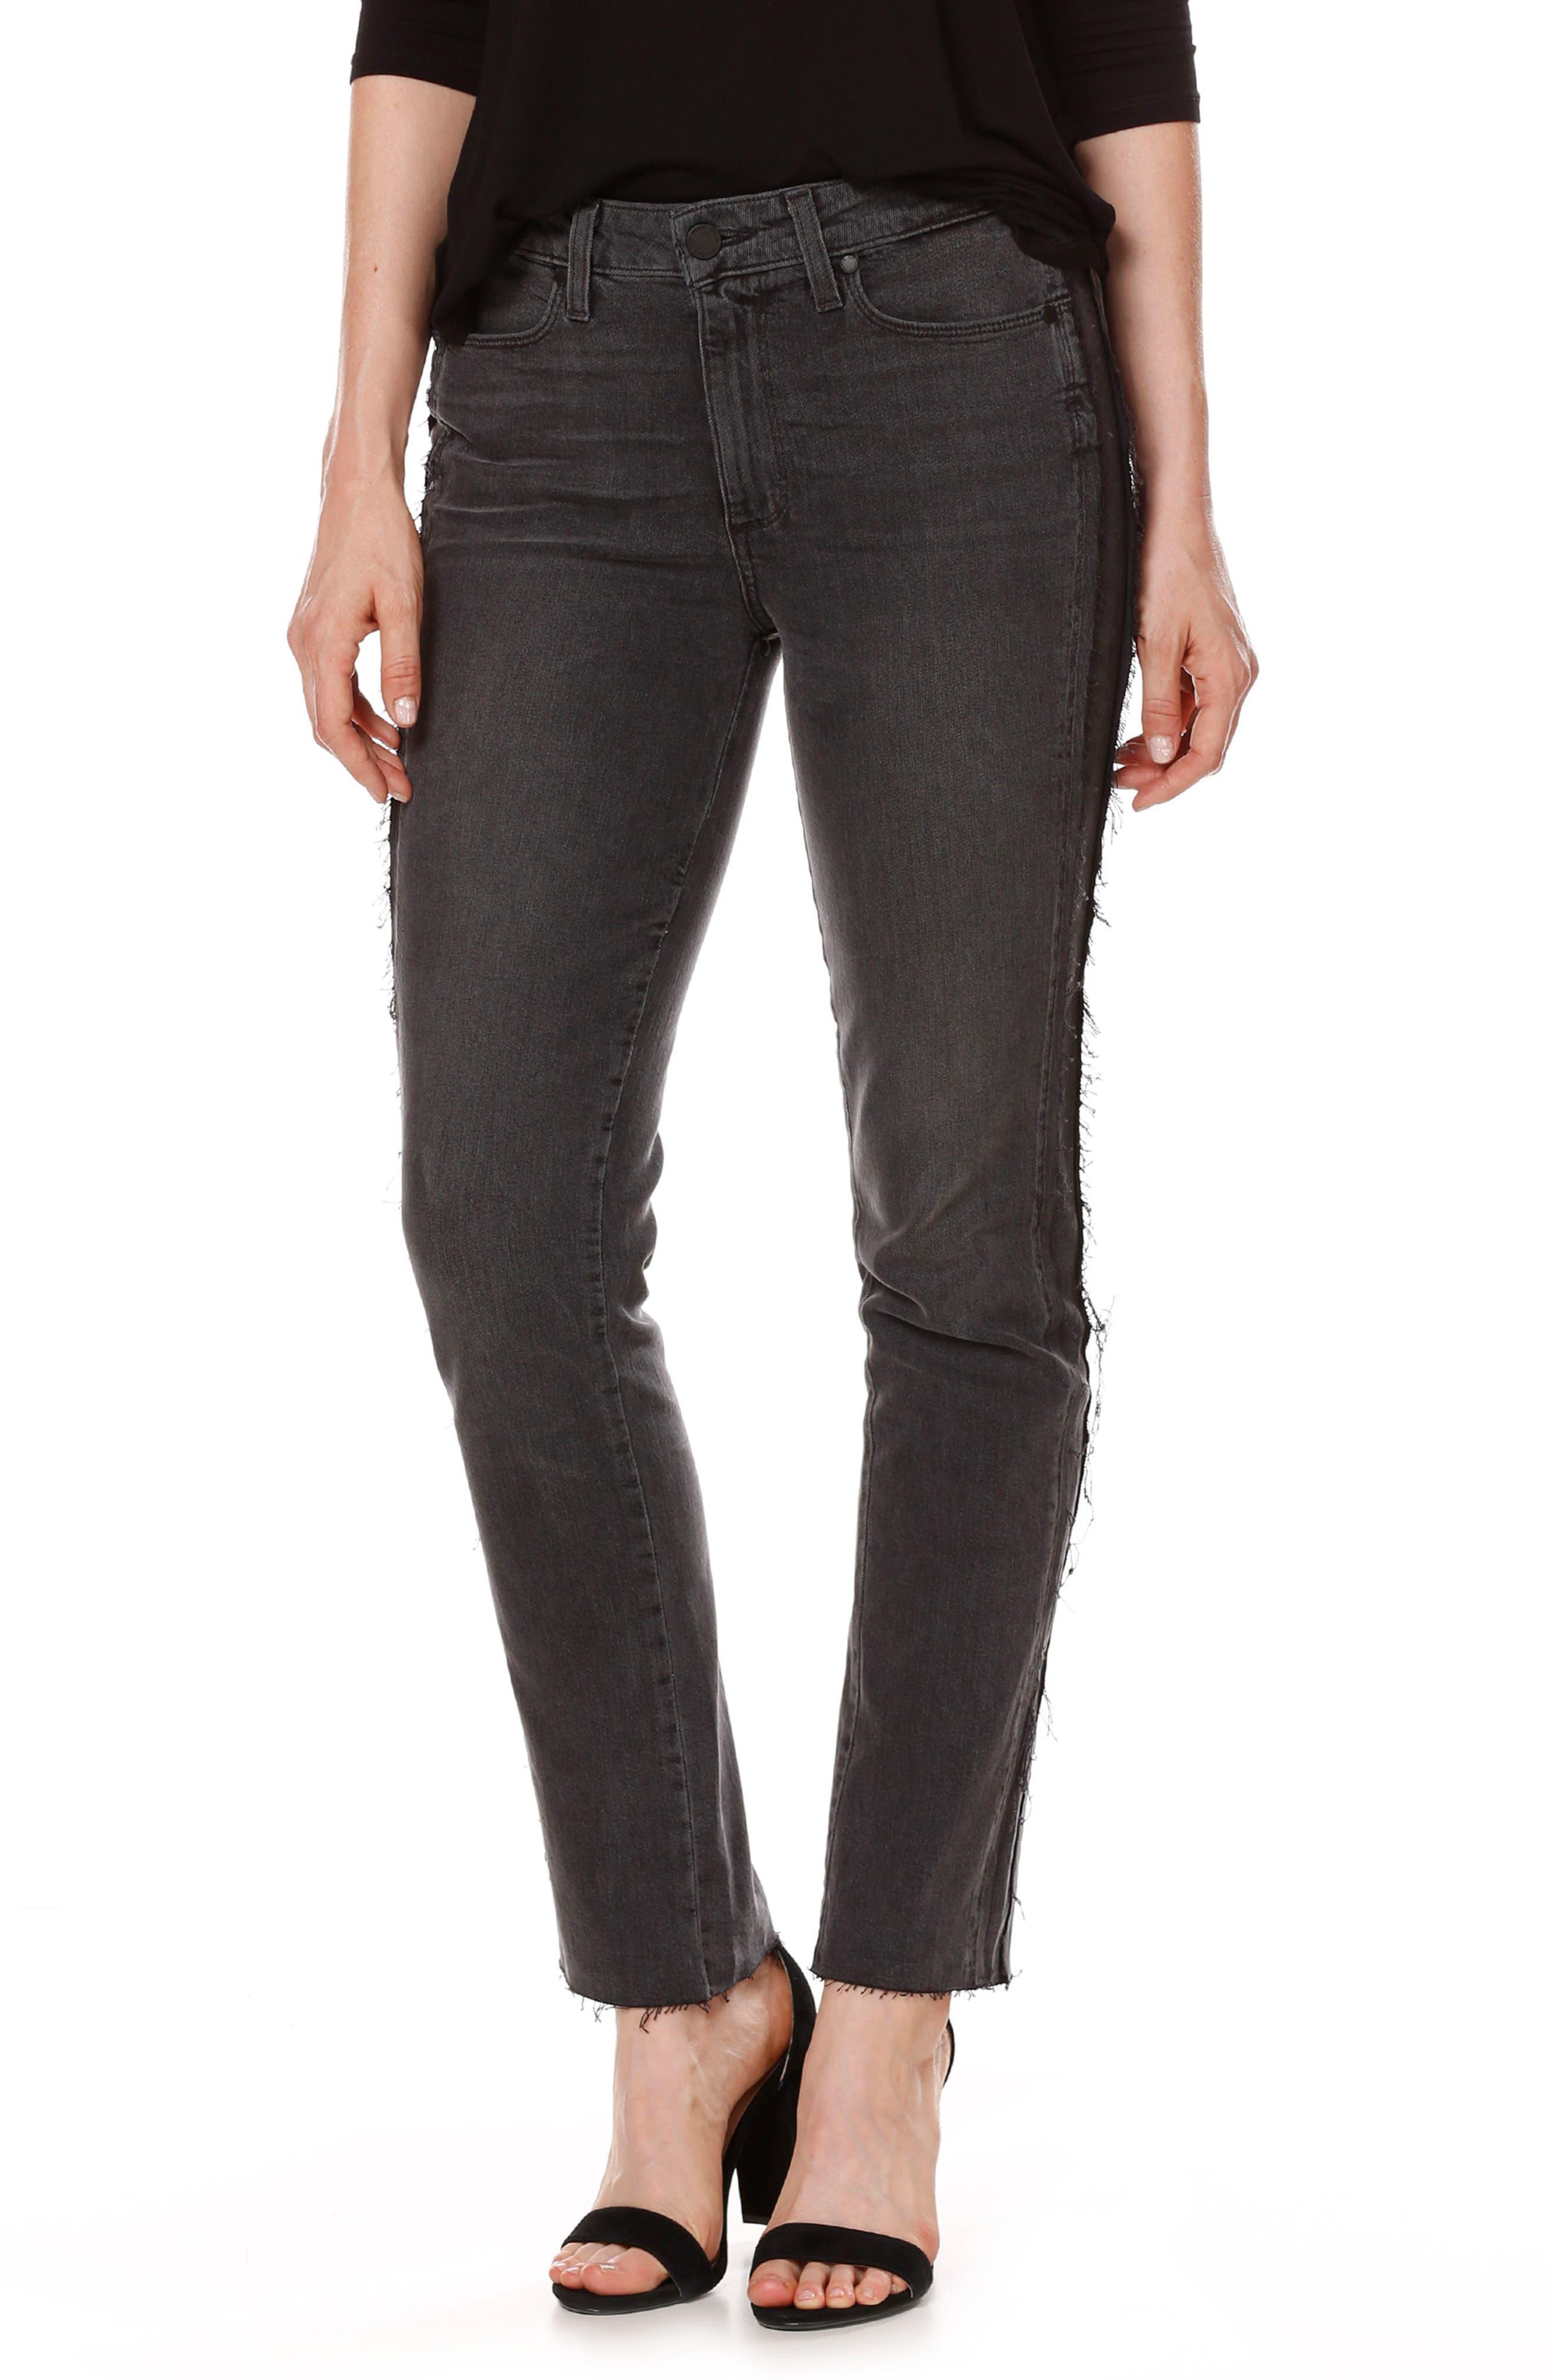 Alternate Image 1 Selected - PAIGE Julia Tux Straight Leg Jeans (Midnight Racer)